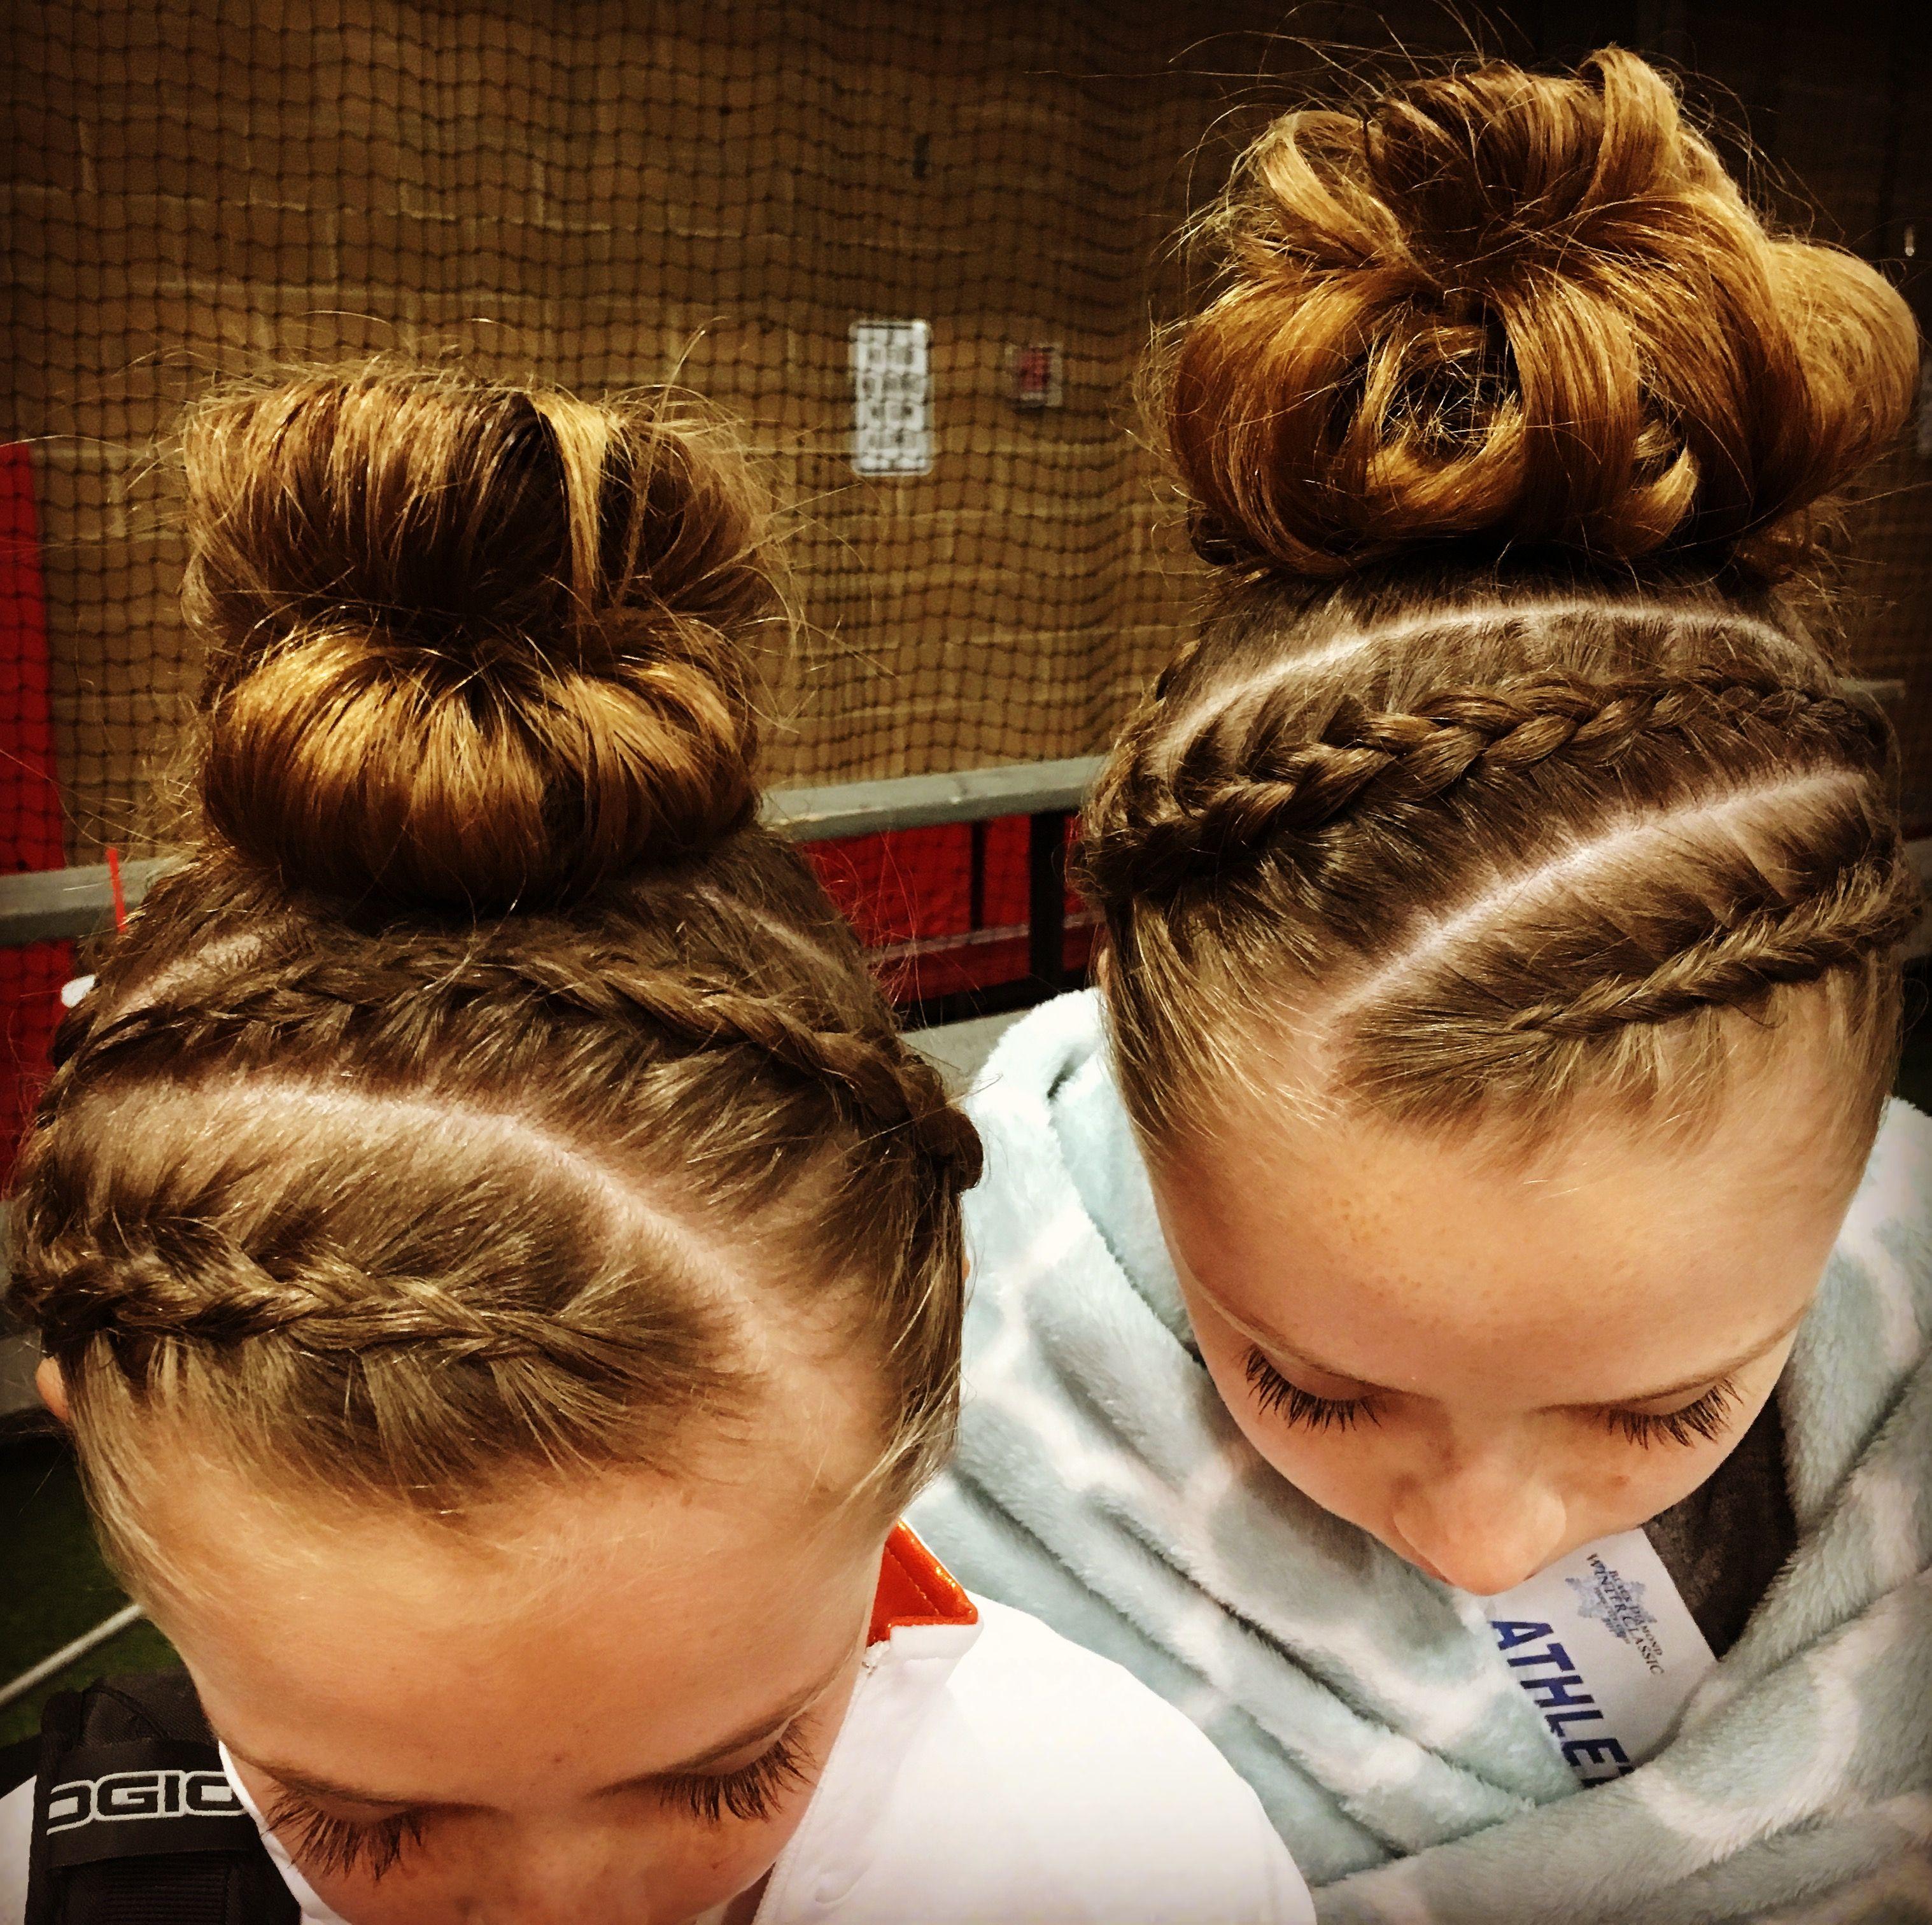 Star Wars Stormtrooper Dot Big Youth Silk Tie Gymnastics Meet Hair Competition Hair Gymnastics Hair